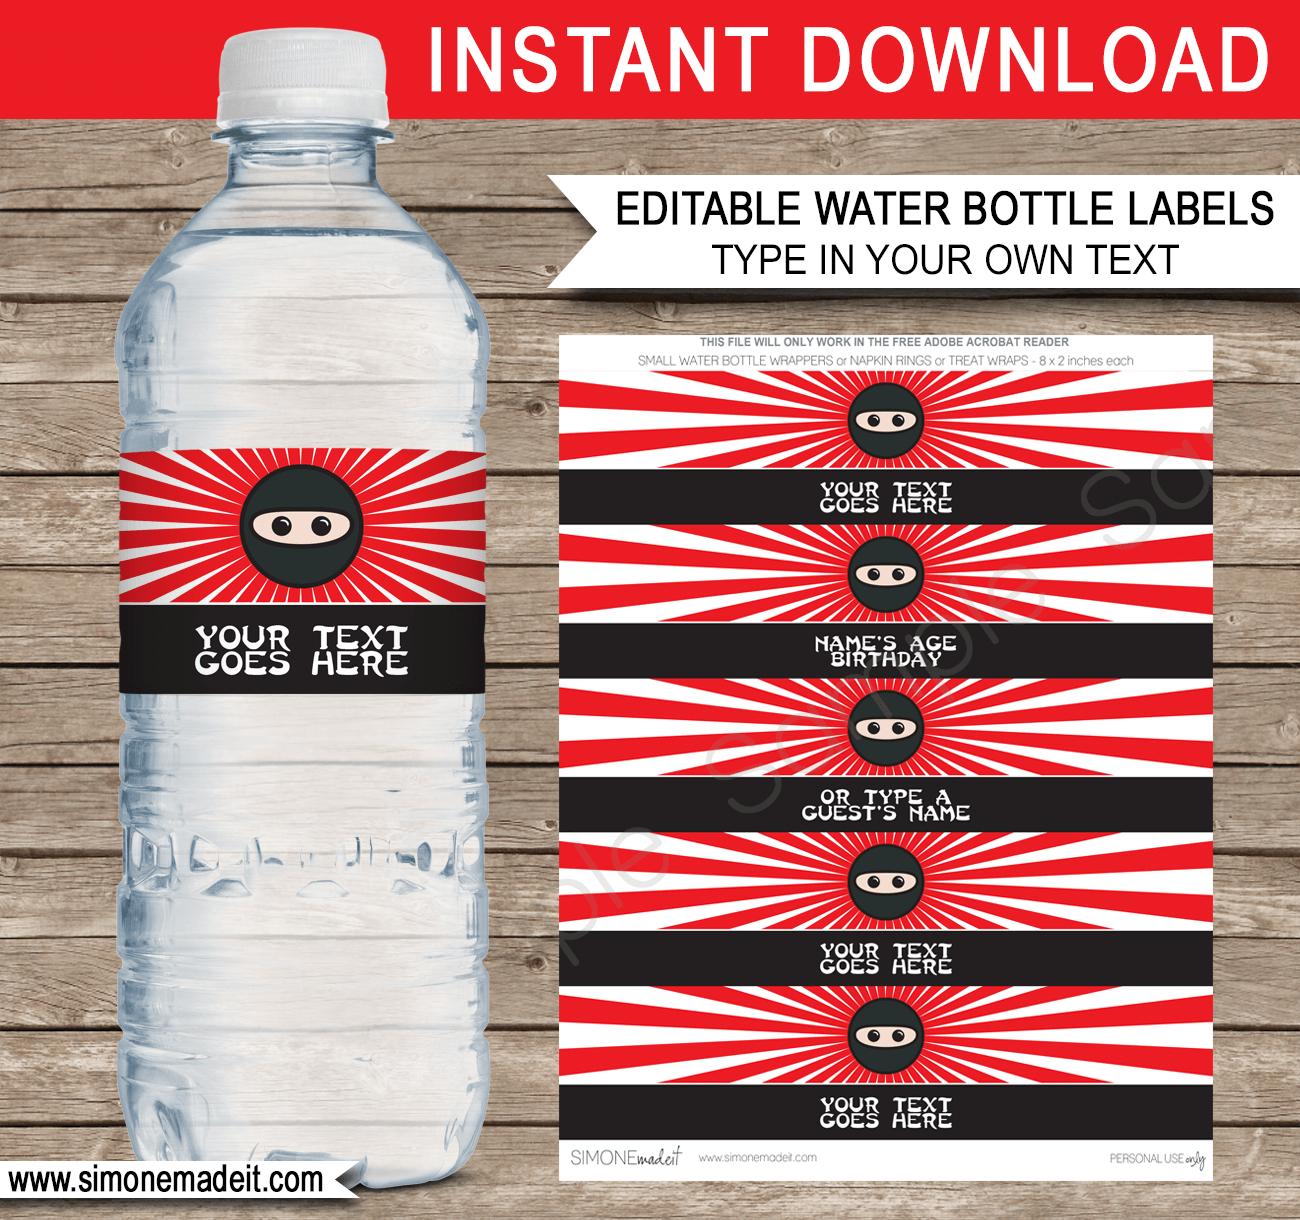 Ninja Water Bottle Labels Template | Ninja Theme Birthday Party - Free Printable Paris Water Bottle Labels